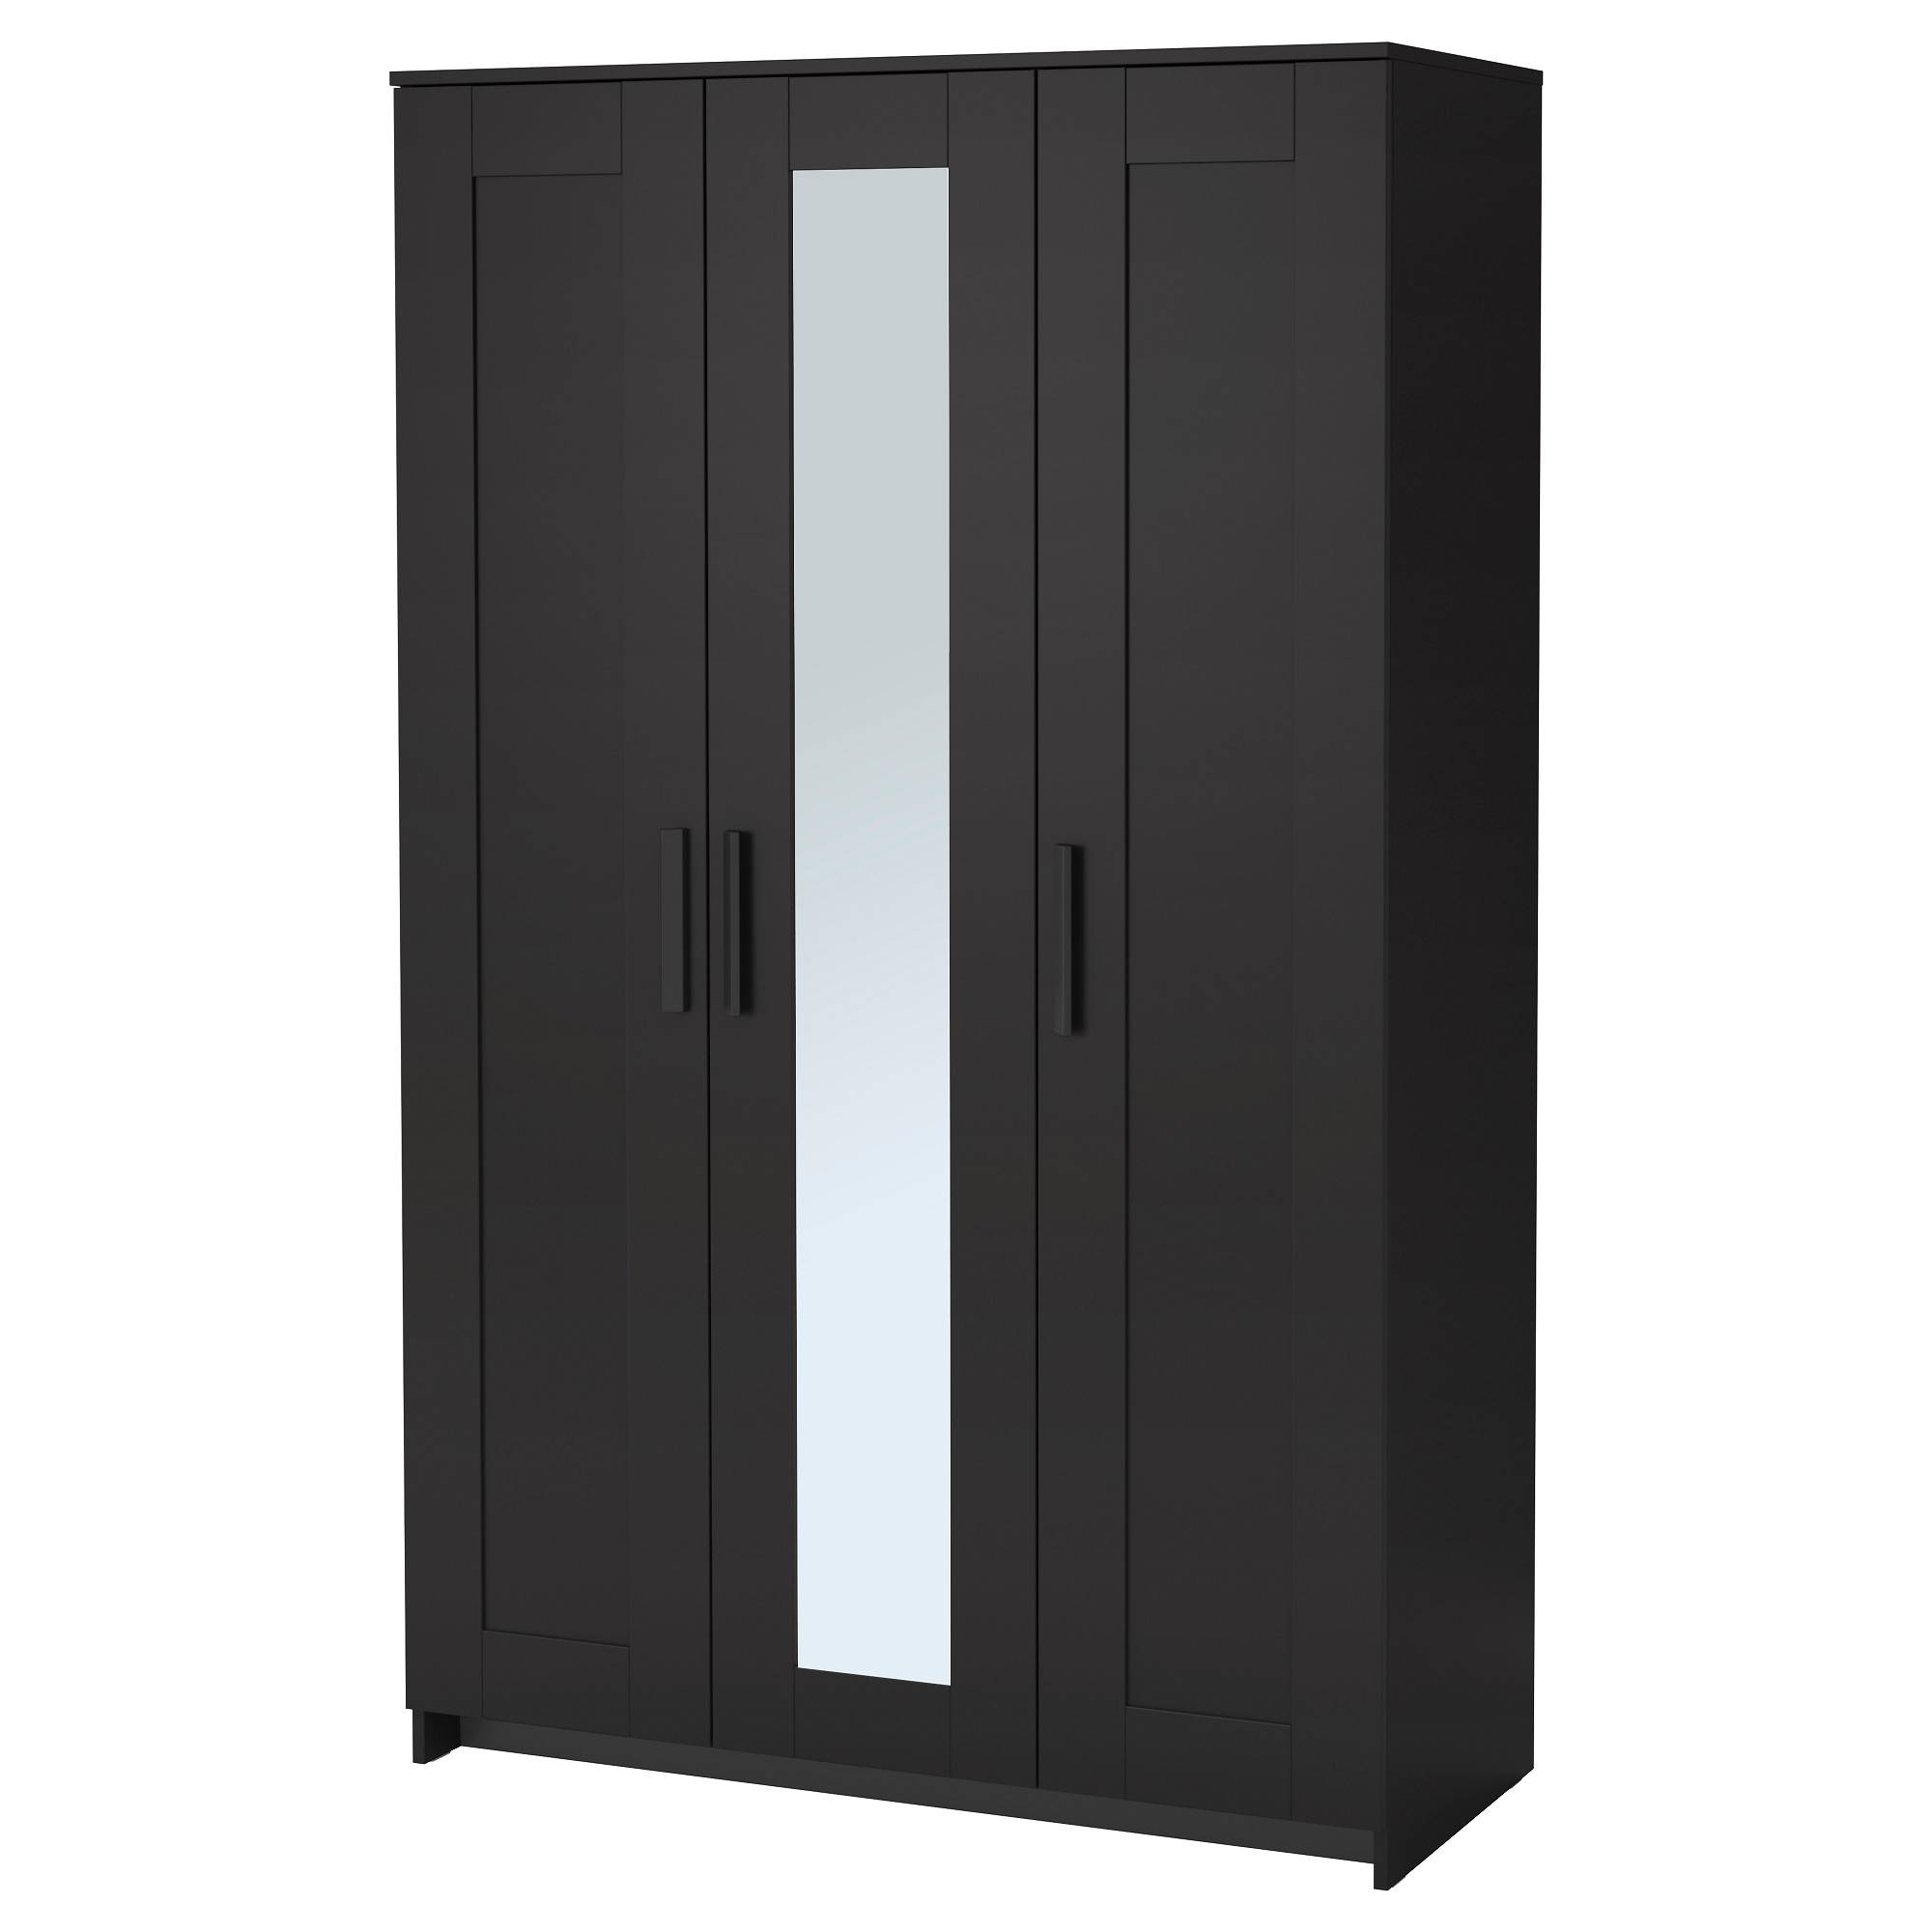 Brimnes Wardrobe With 3 Doors - Black - Ikea throughout Dark Wardrobes (Image 8 of 30)